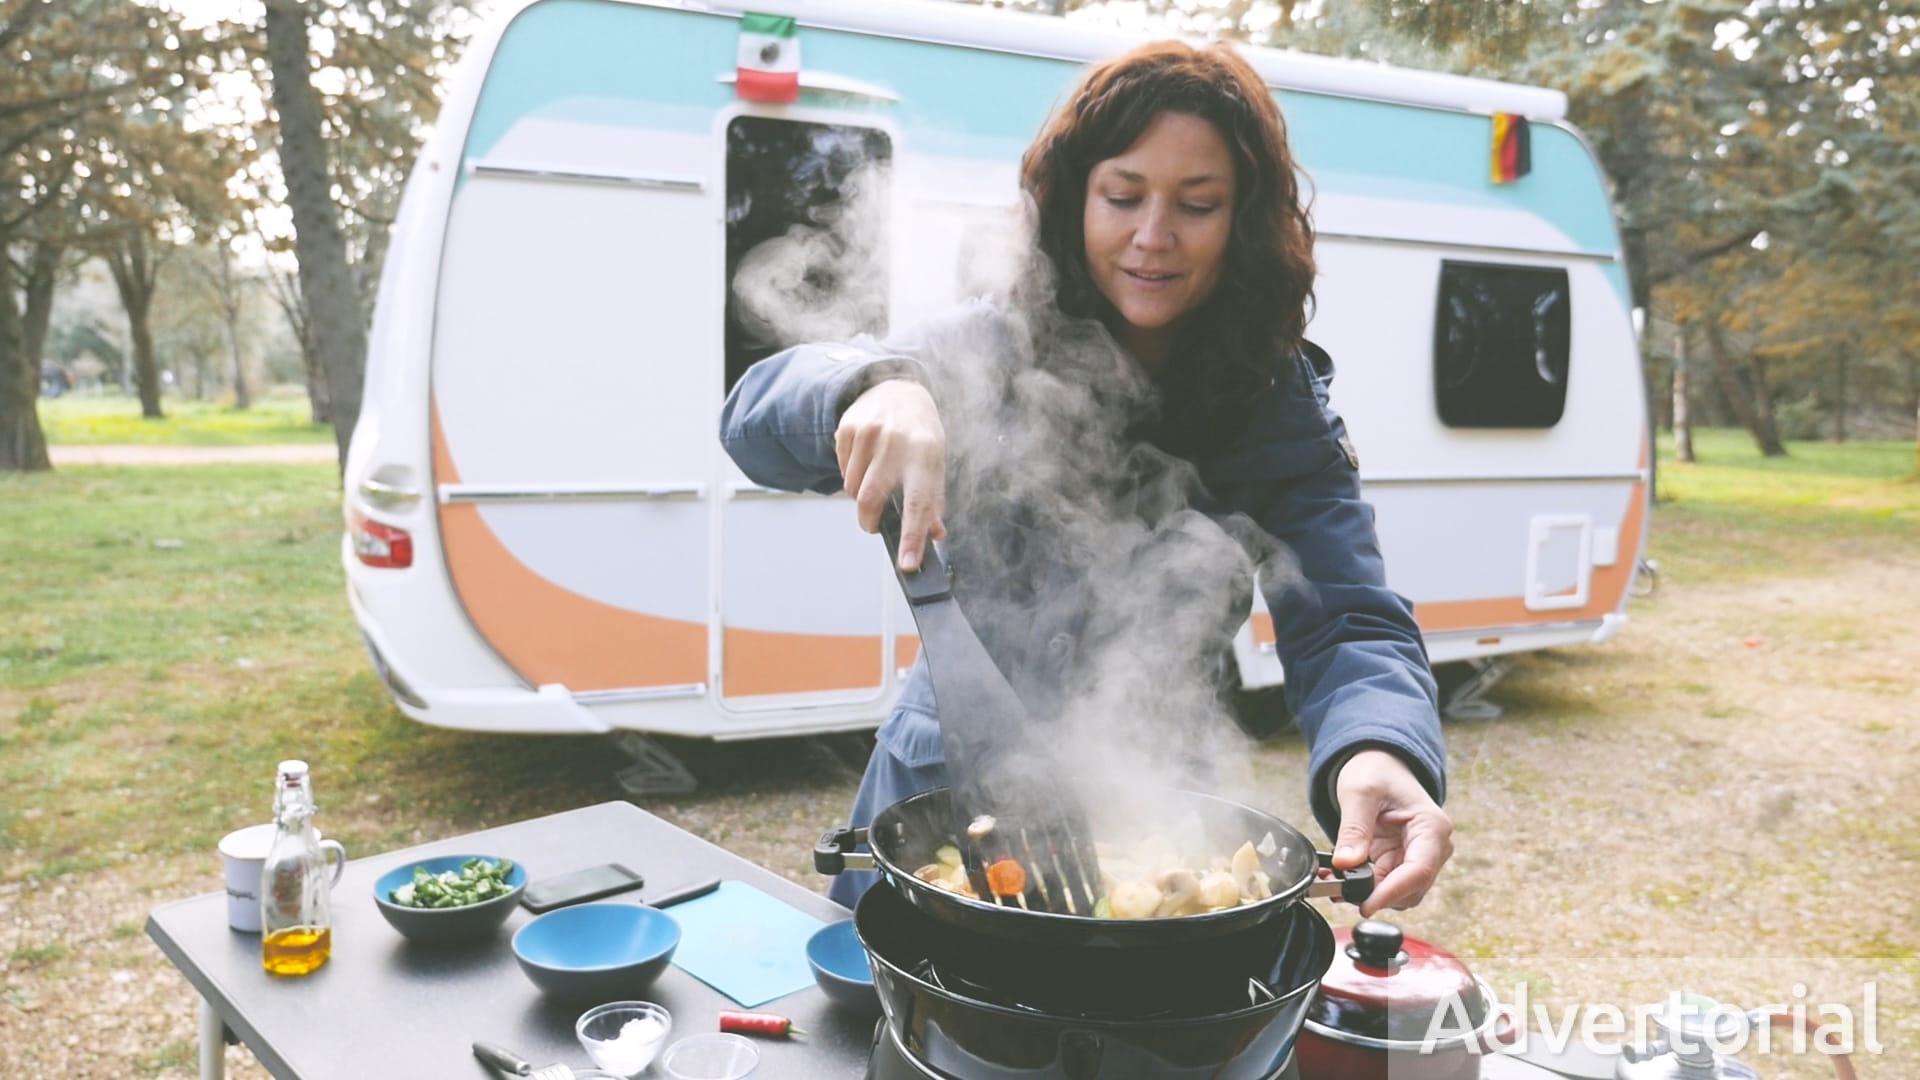 Camping-Rezepte cover image